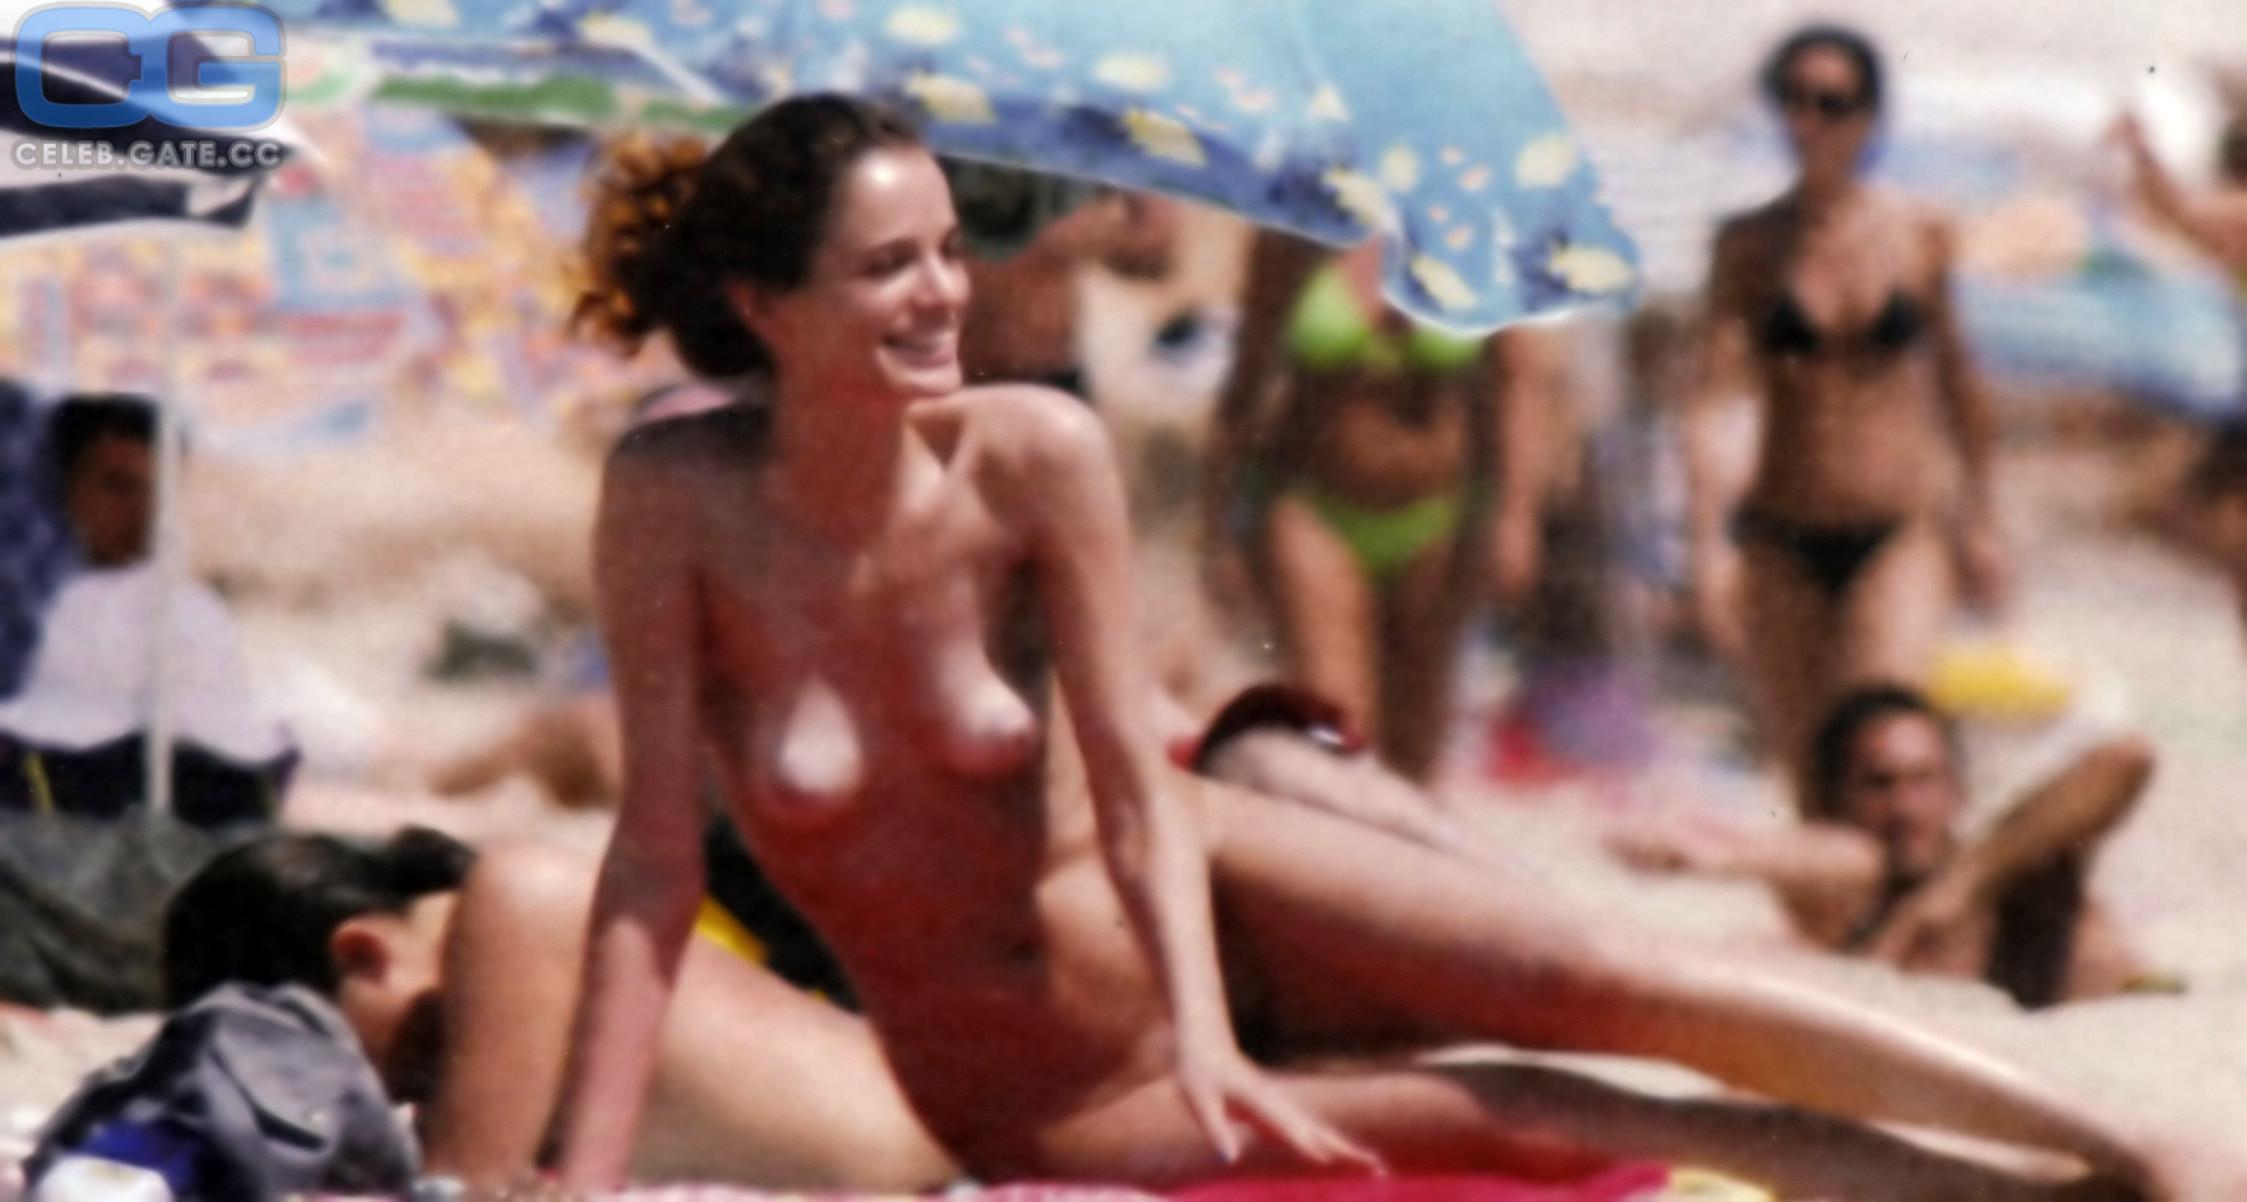 Nude amaral gaia bermani Watch This